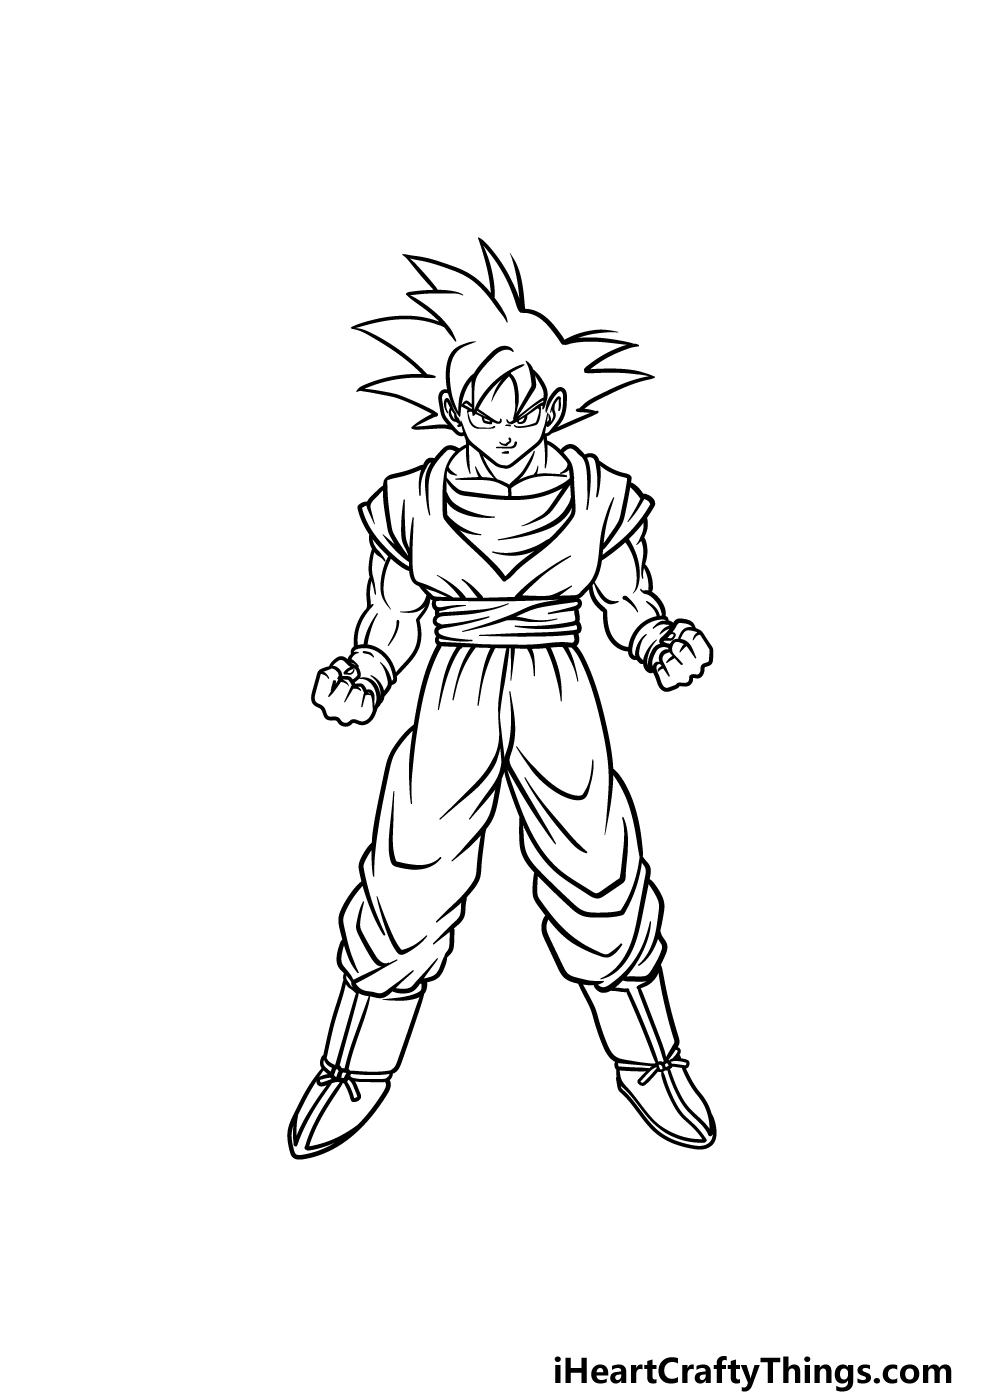 drawing Goku step 5